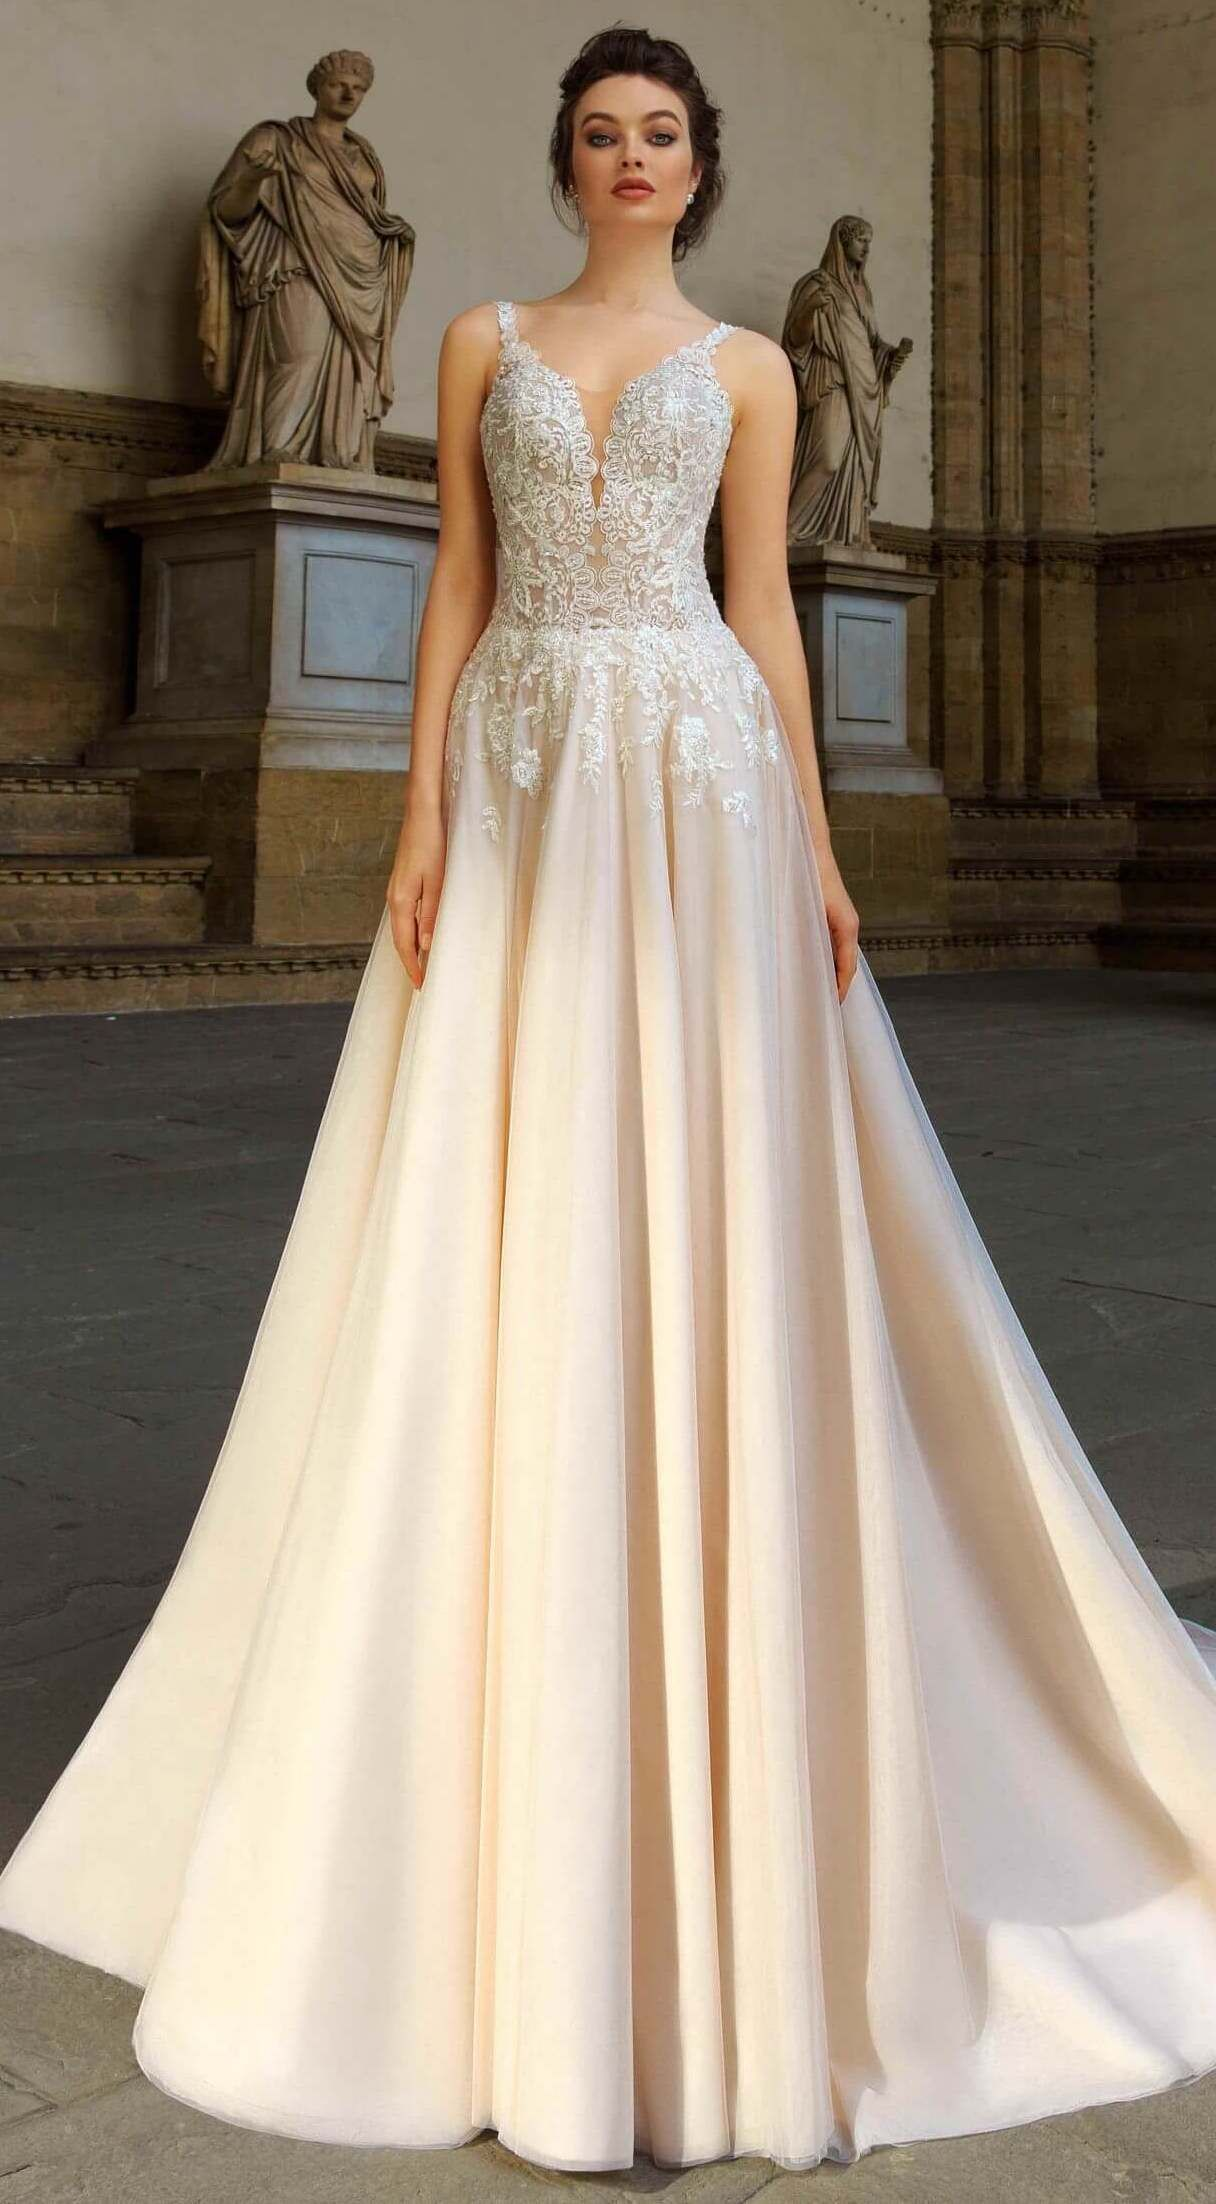 Ball gown wedding dress by innocentia princess ivory